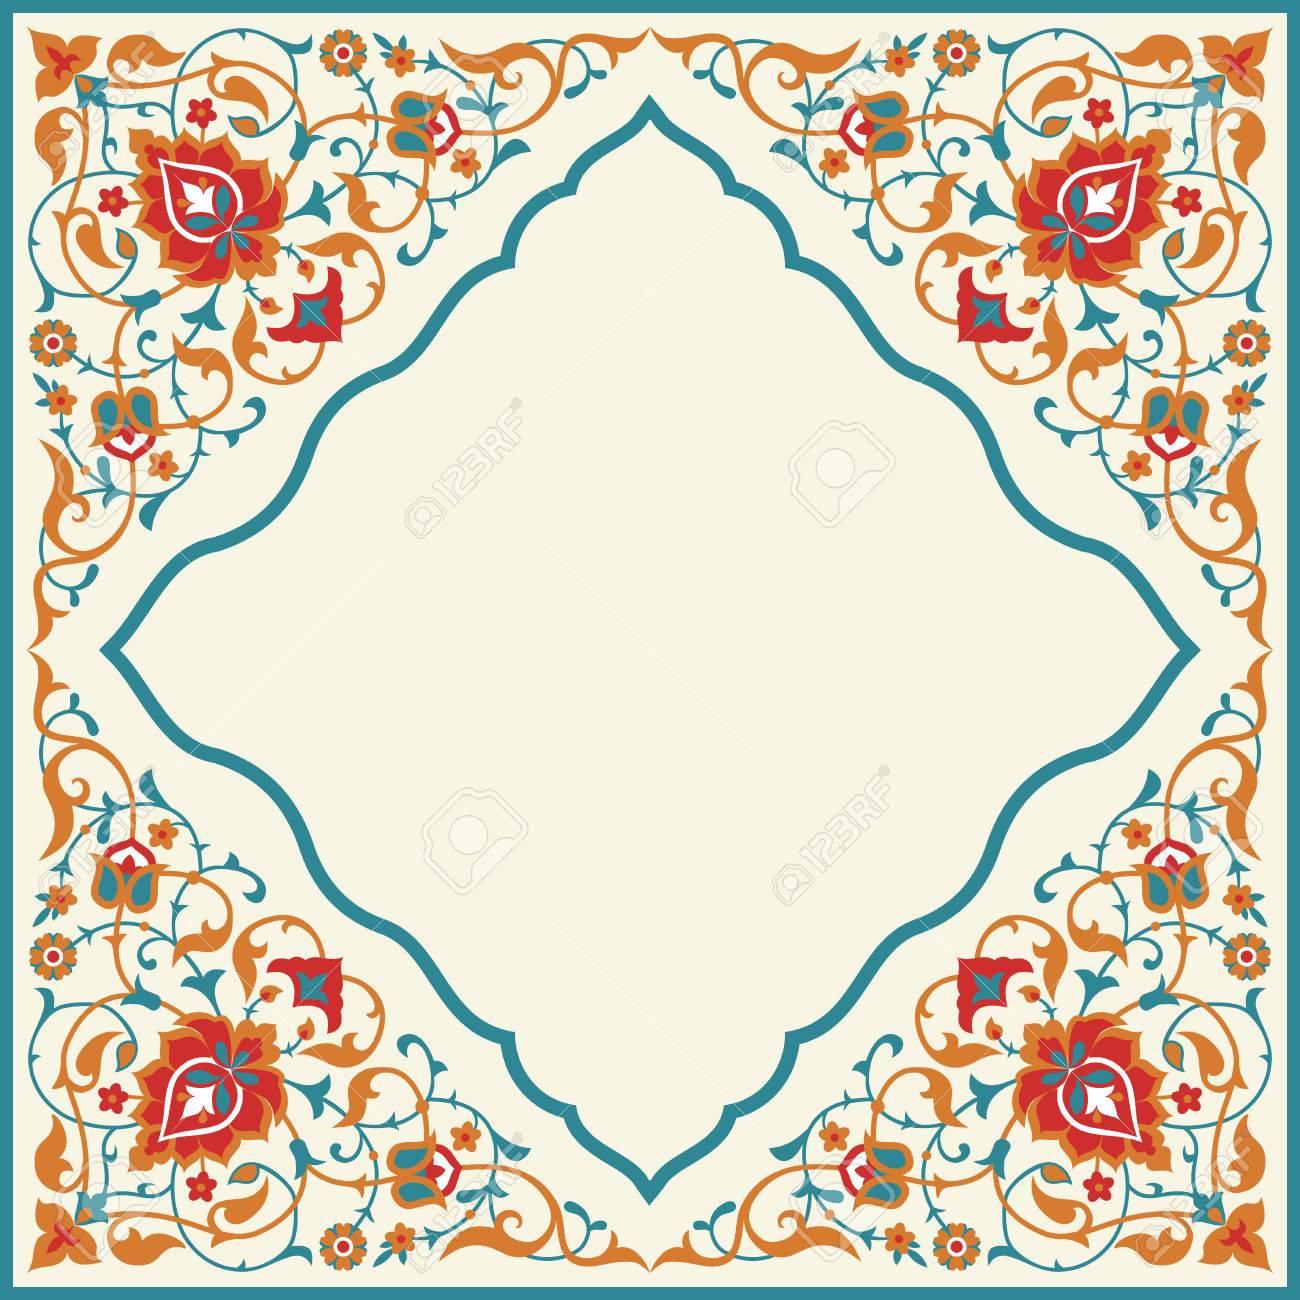 Ornate vintage frame in arabian style template design for greeting ornate vintage frame in arabian style template design for greeting card invitation poster stopboris Images